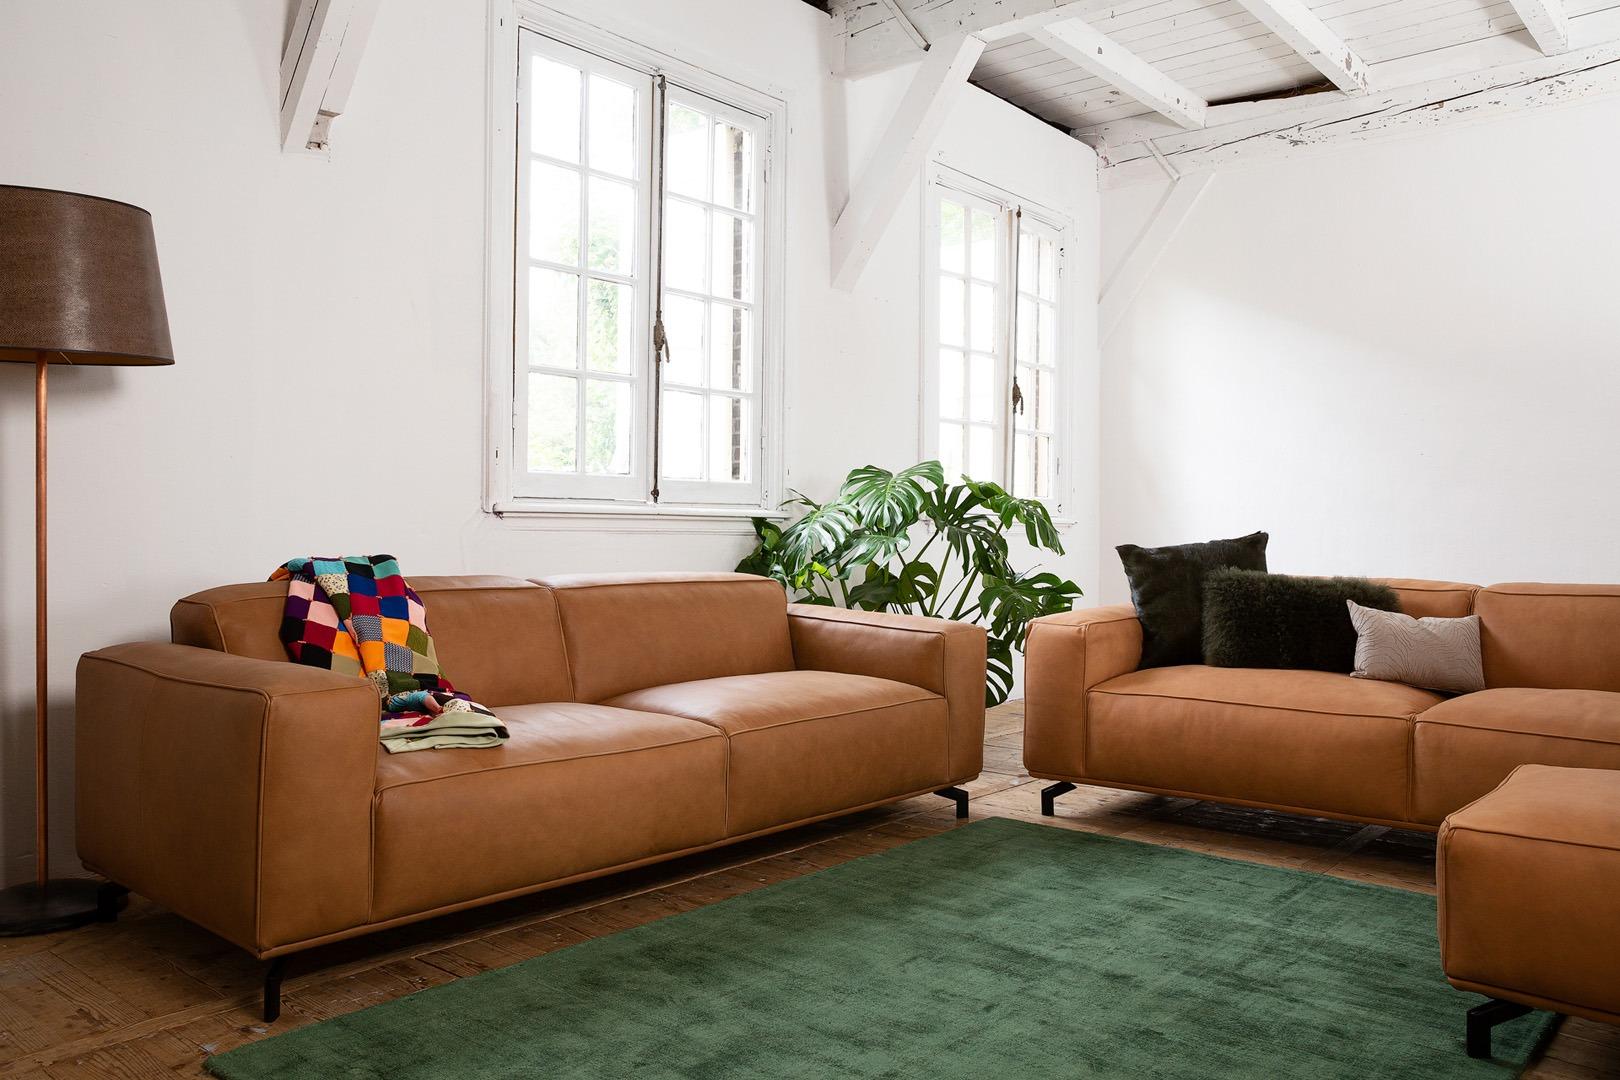 chill-ibiza-leren-congac-banken-soofs-interieur (1)